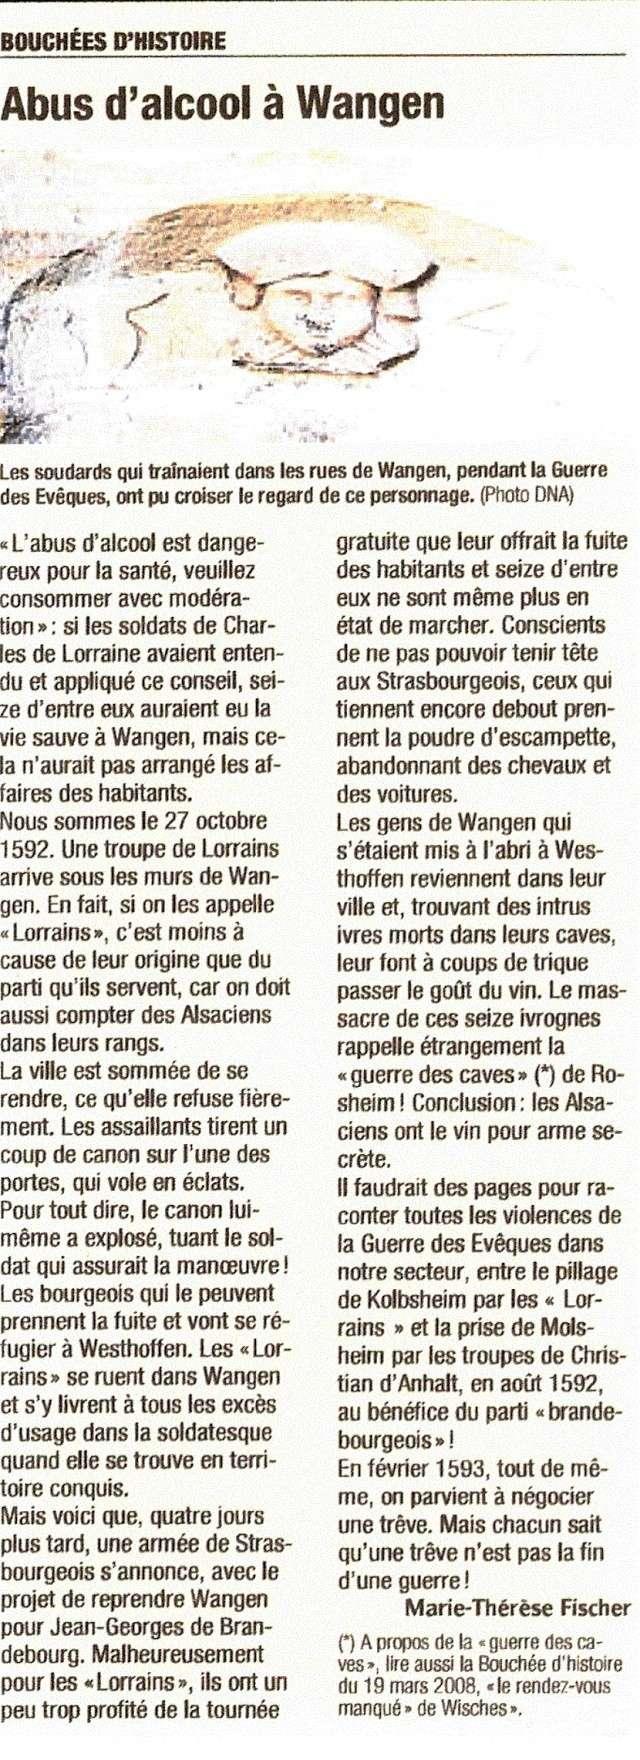 Wangen - Bouchées d'Histoire- Marie-Thérèse Fischer-DNA Numari82